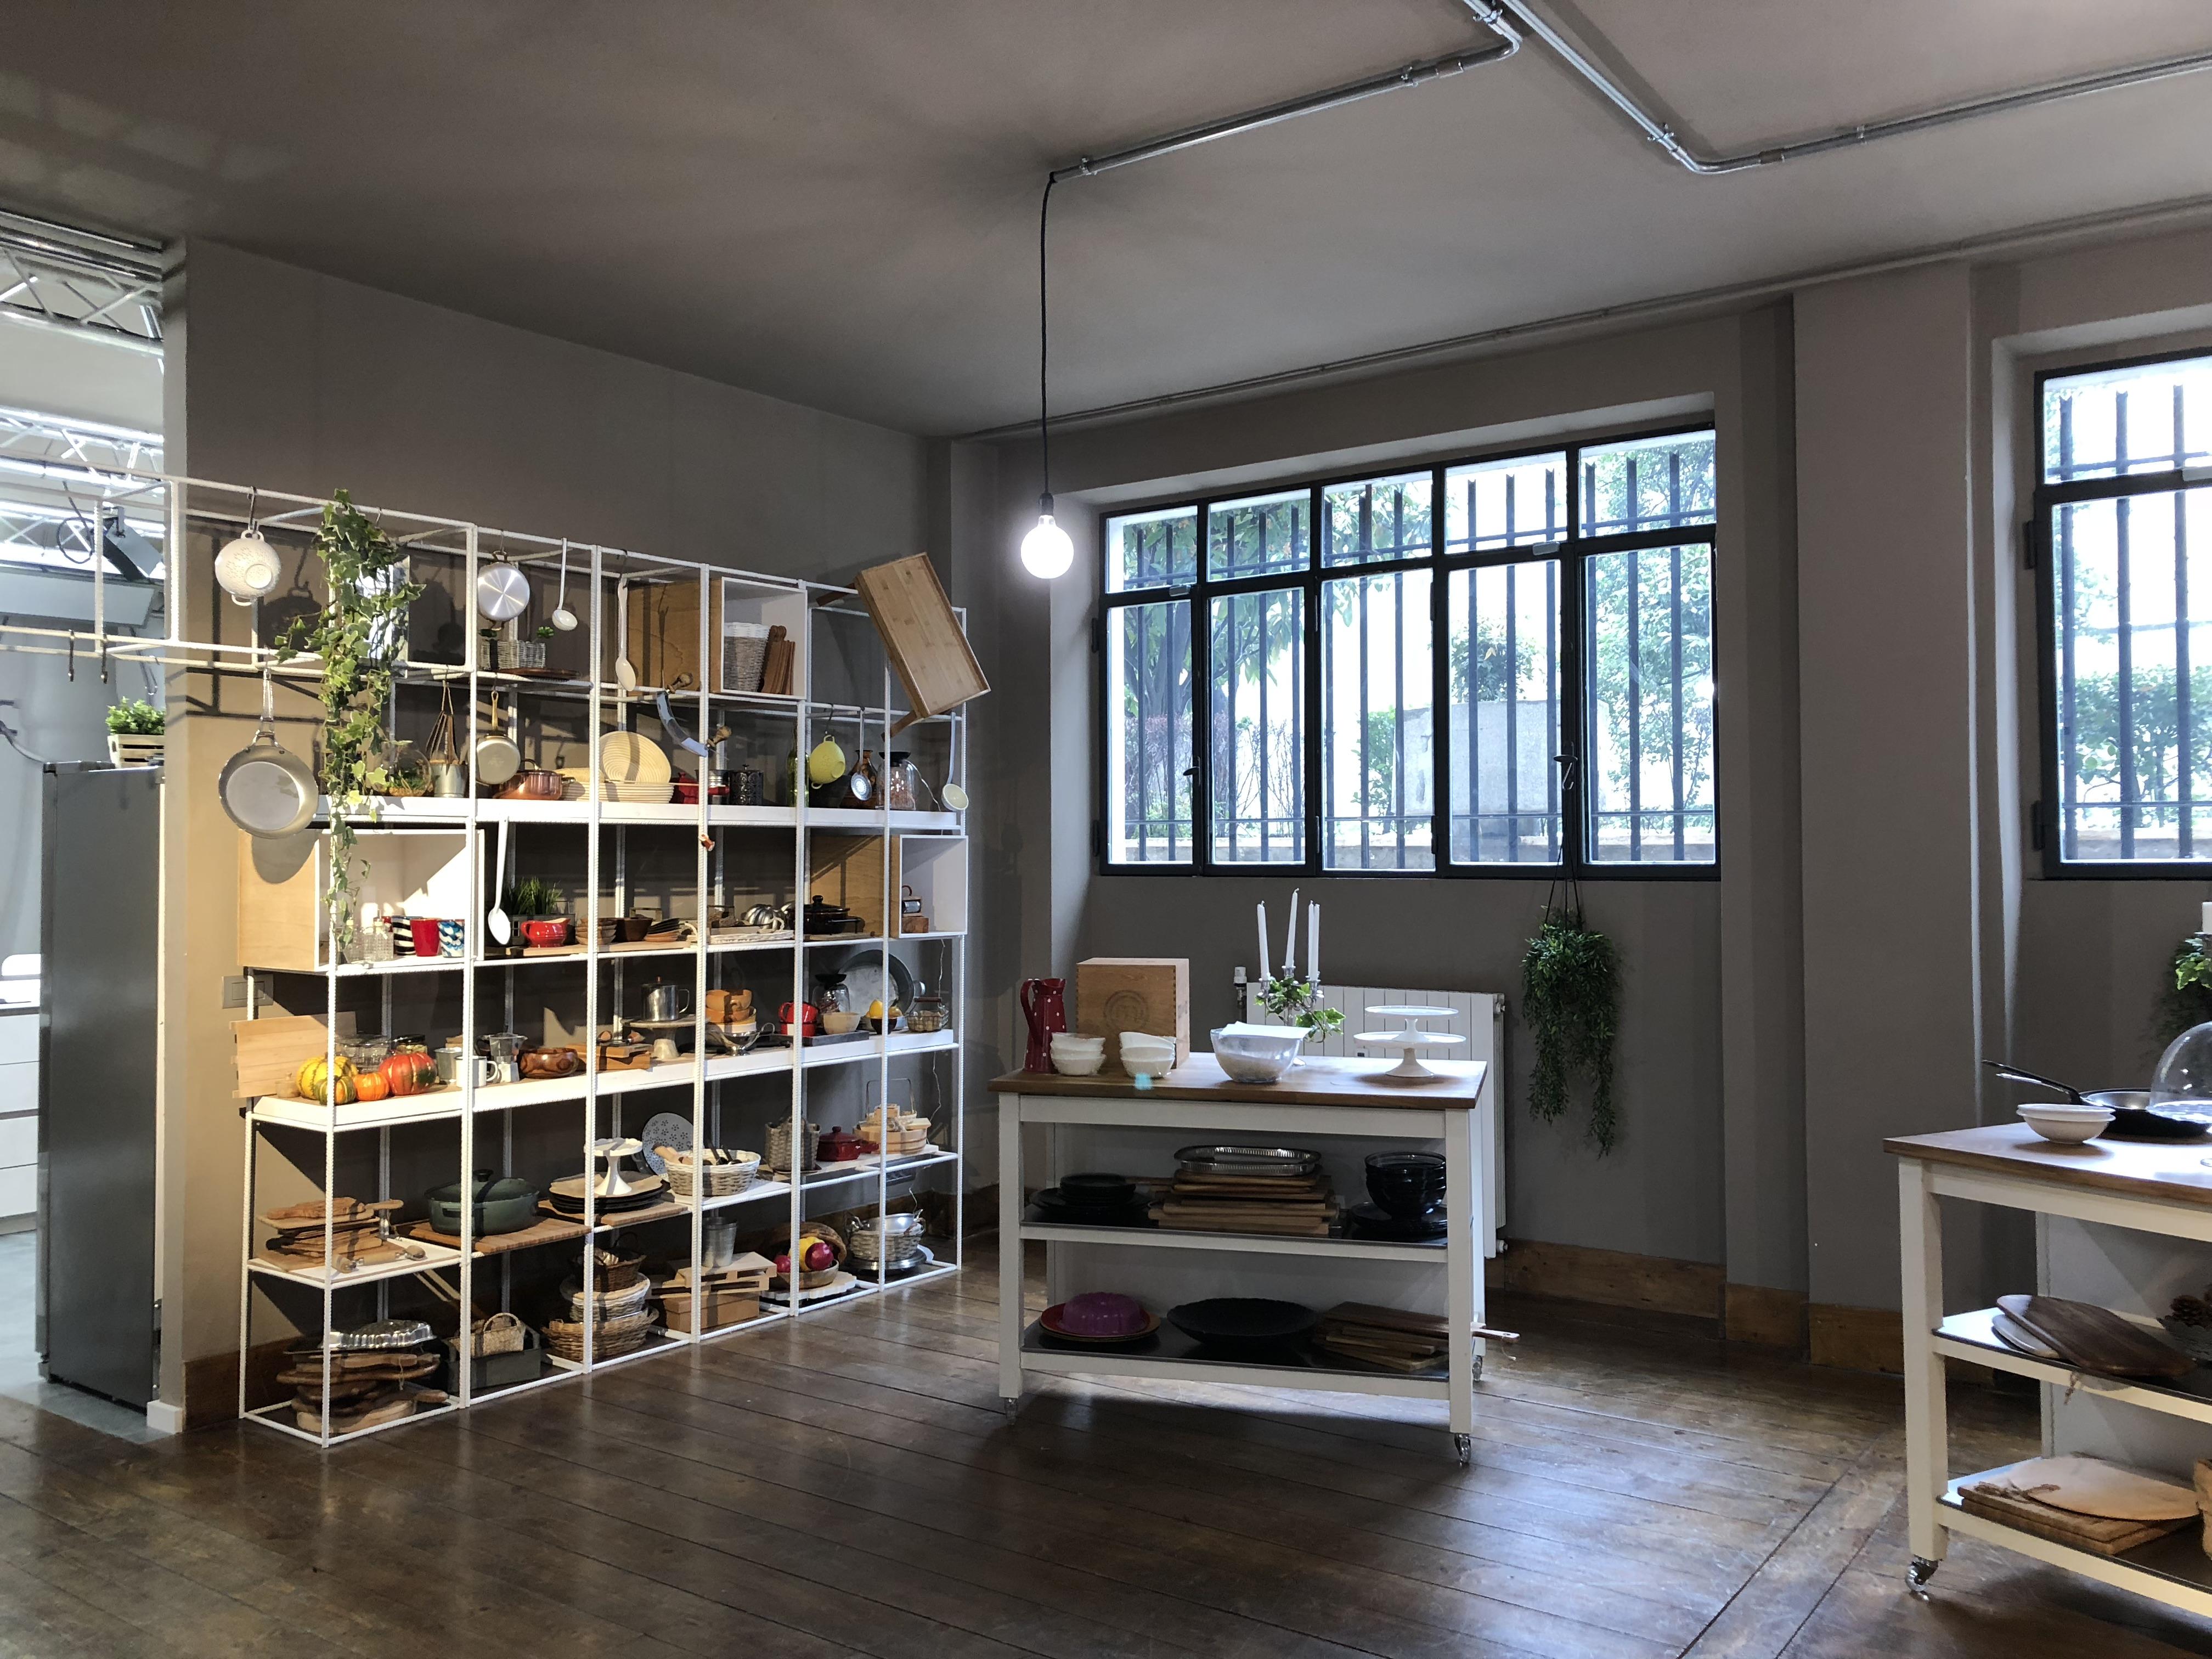 Sonia's Factory di Sonia Peronaci